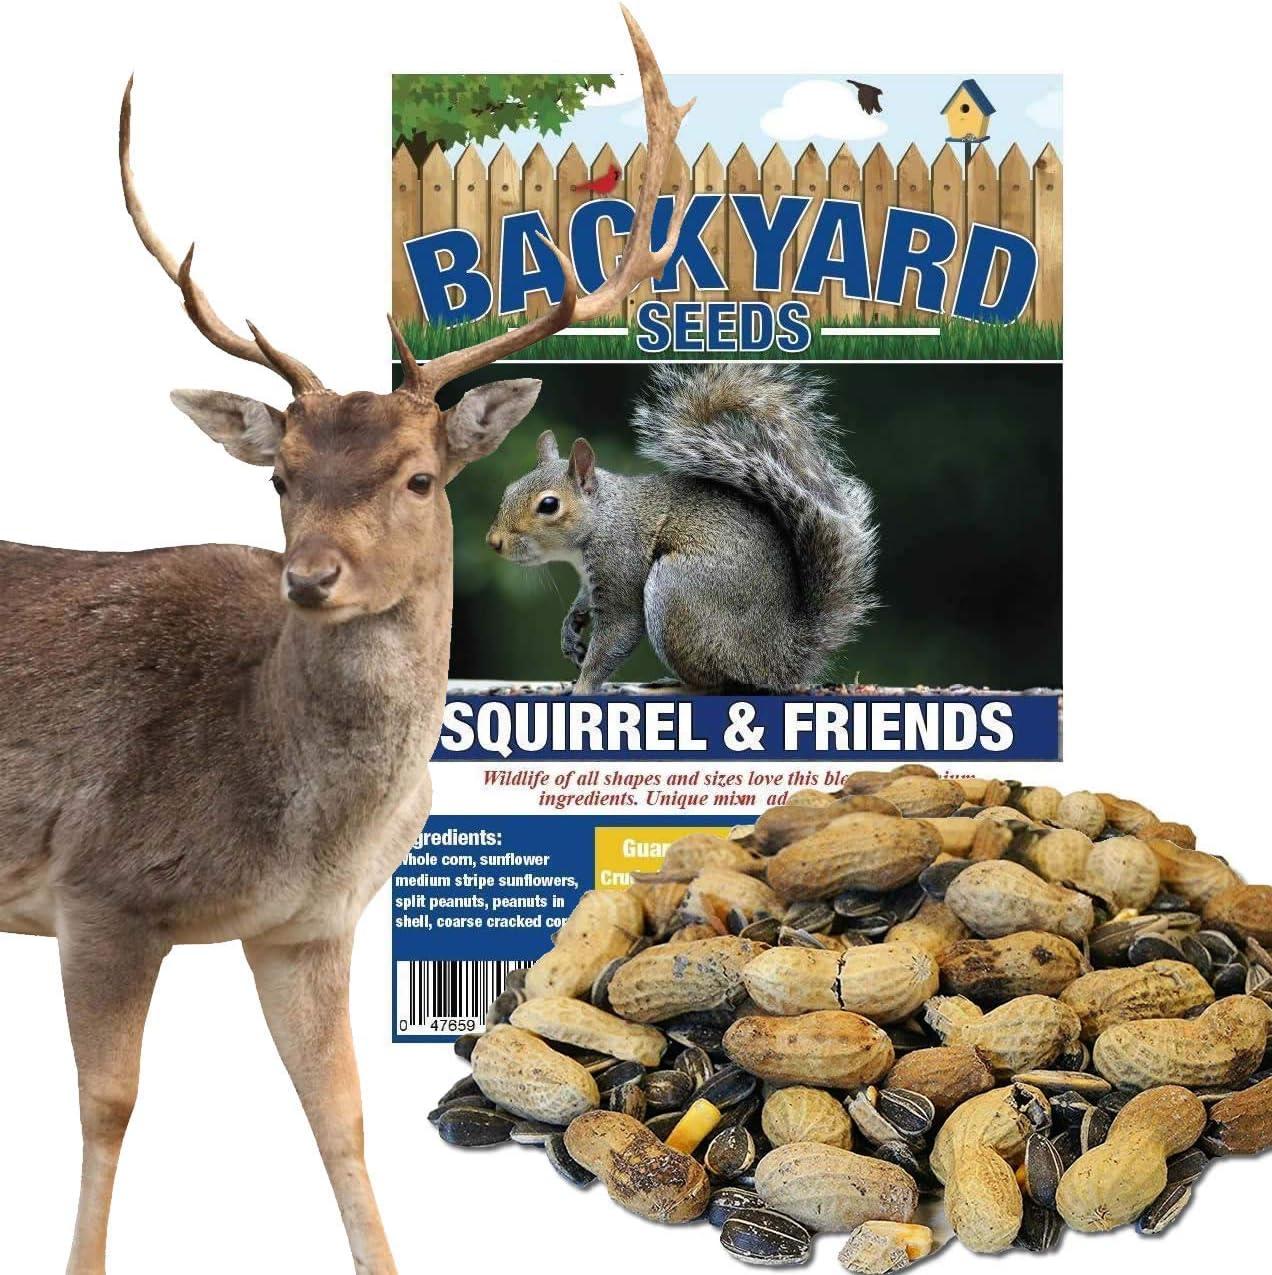 Backyard Seeds Squirrel, Deer Feed & Wildlife Mix 20 Pounds